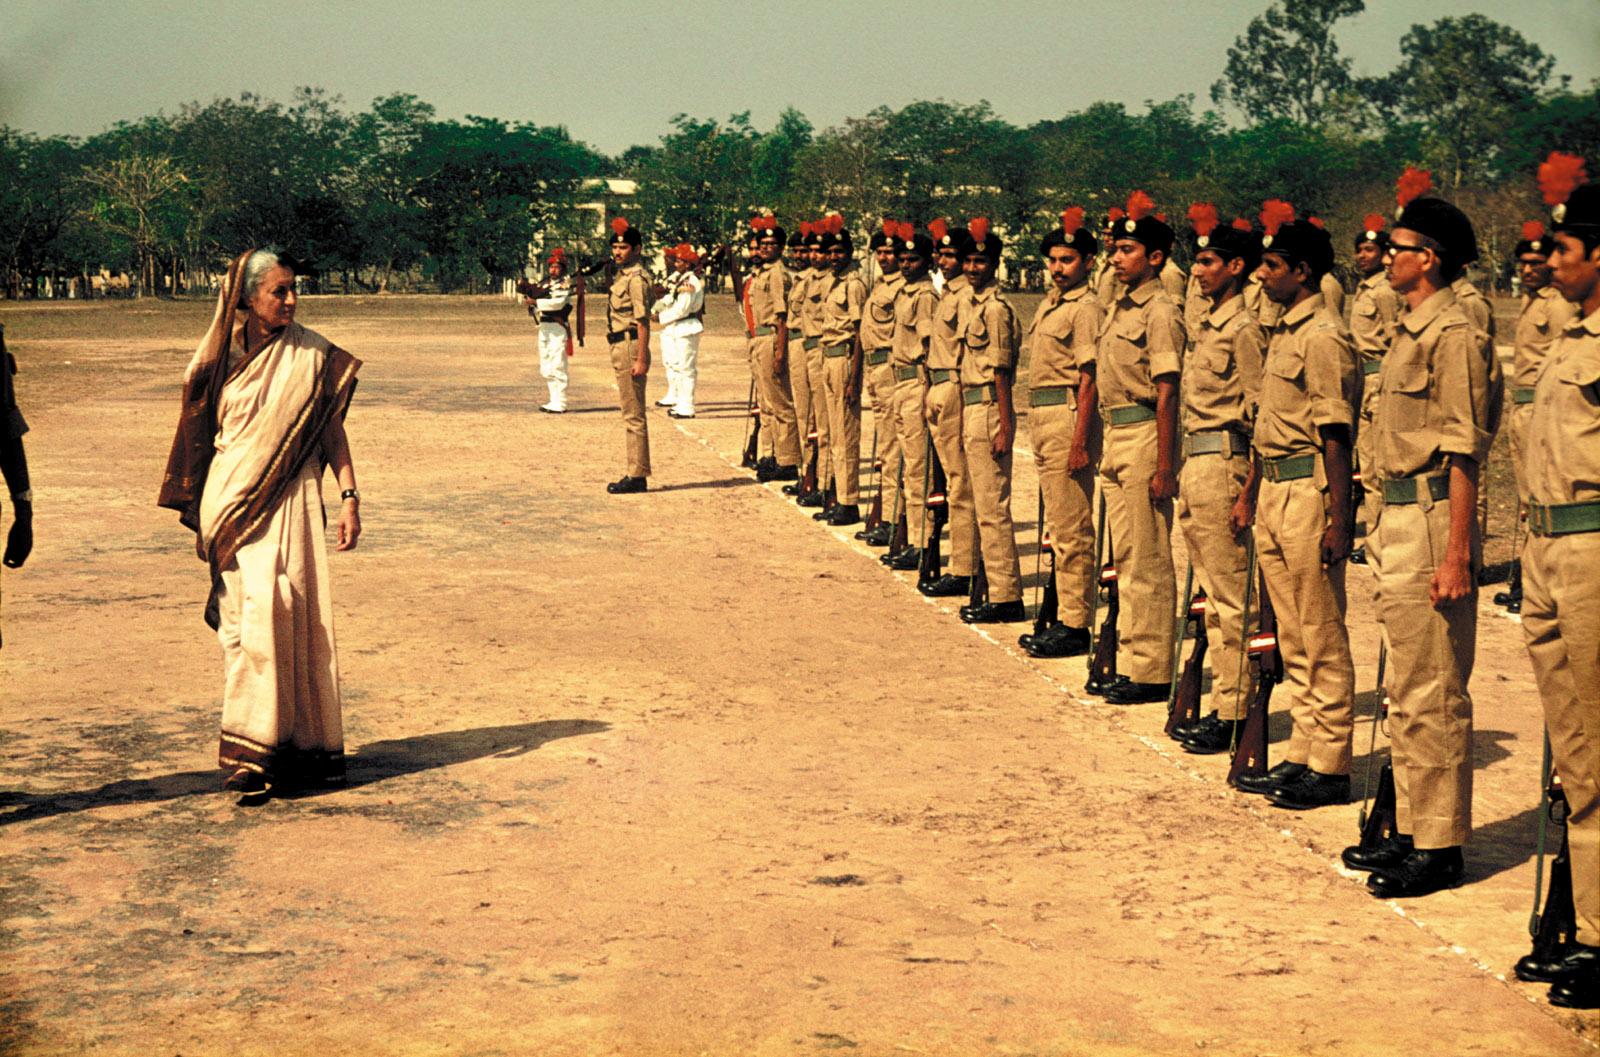 Indira Gandhi inspecting troops, Calcutta